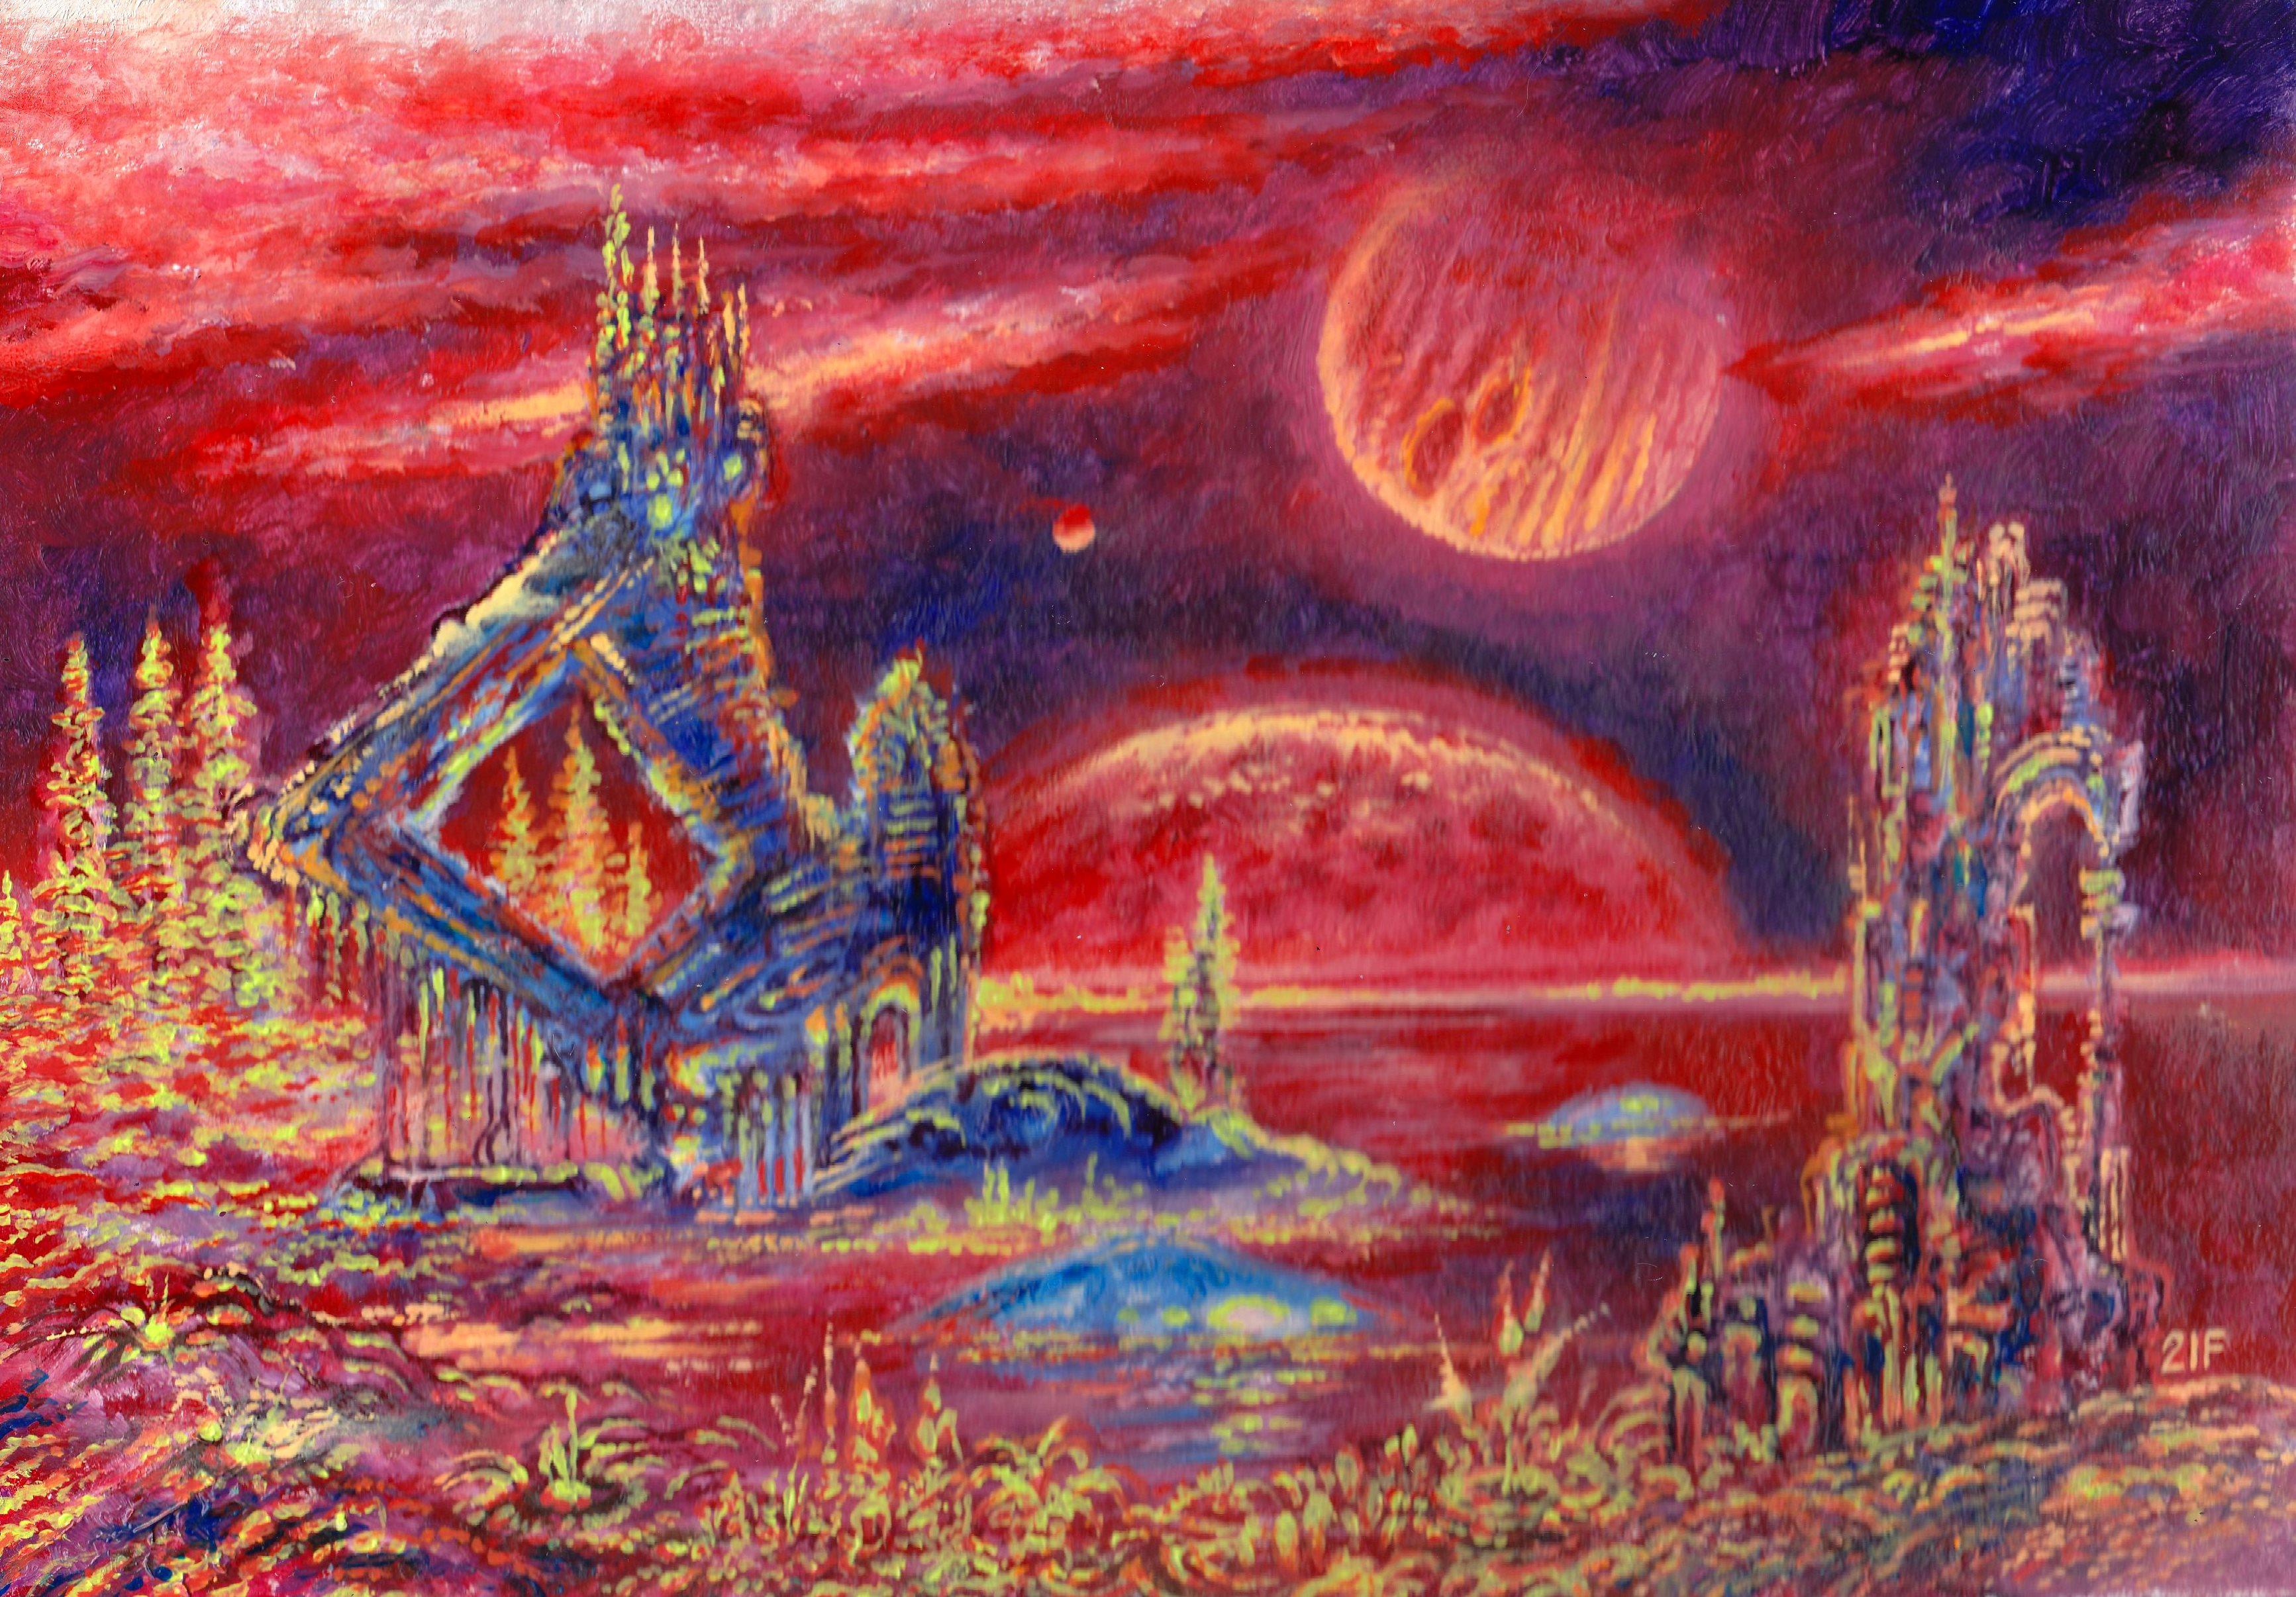 Вид на Юпитер с Ганимеда через миллиарды лет. - Victor Filippsky